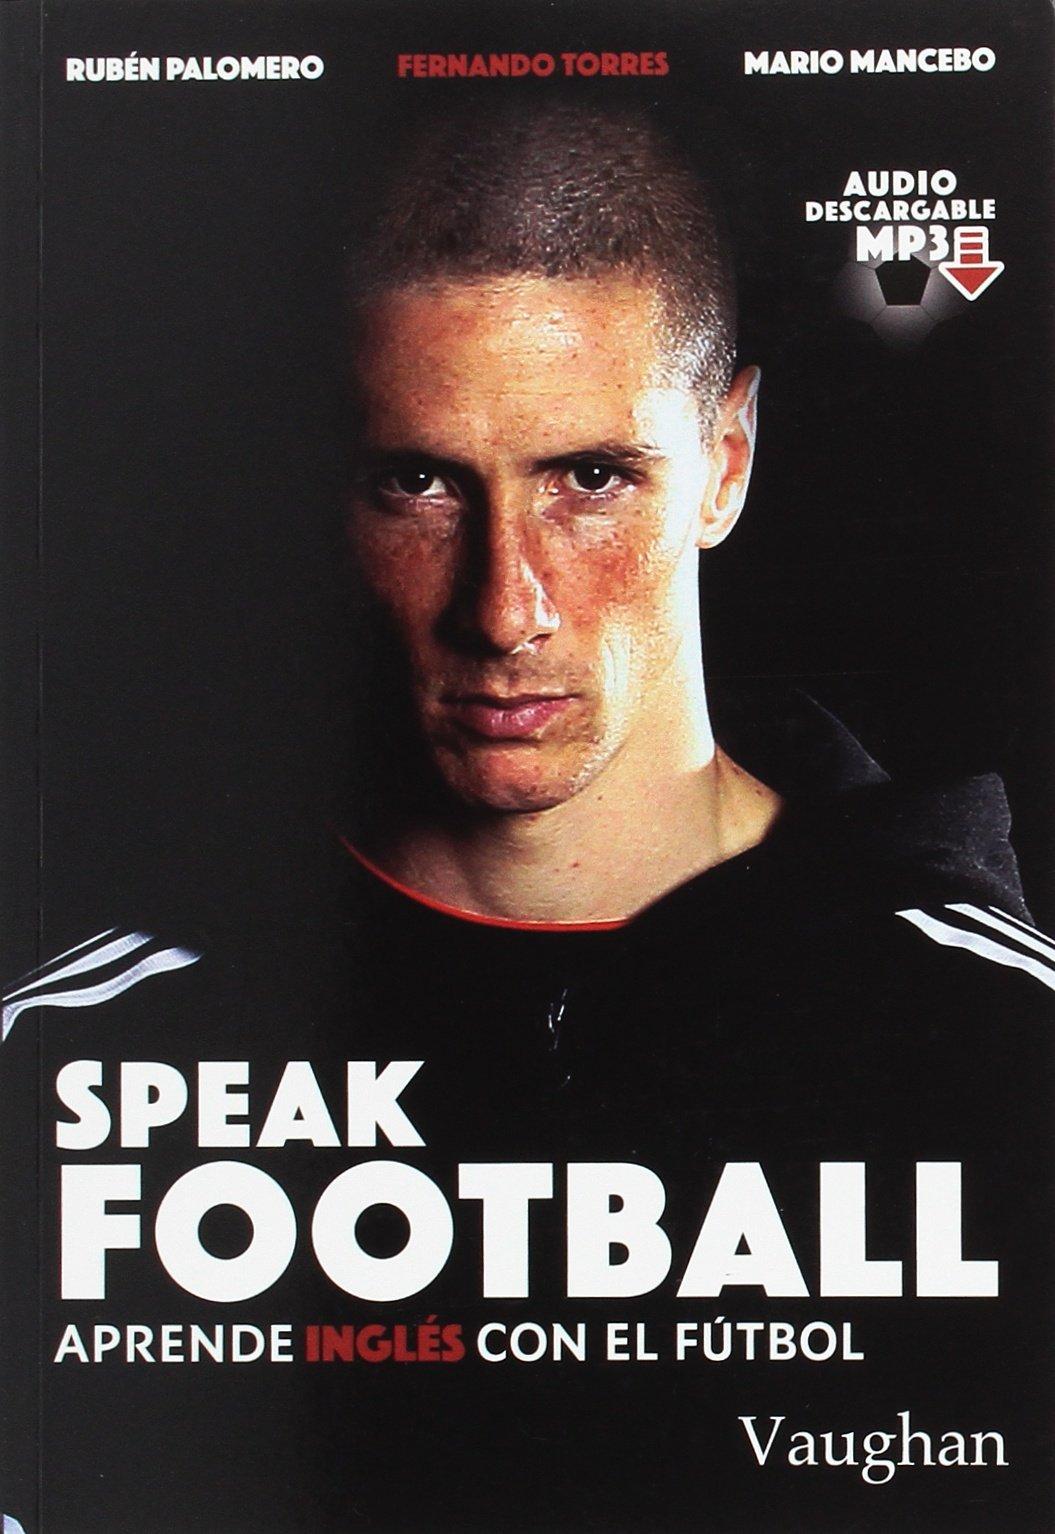 Comprar libro Speak Football